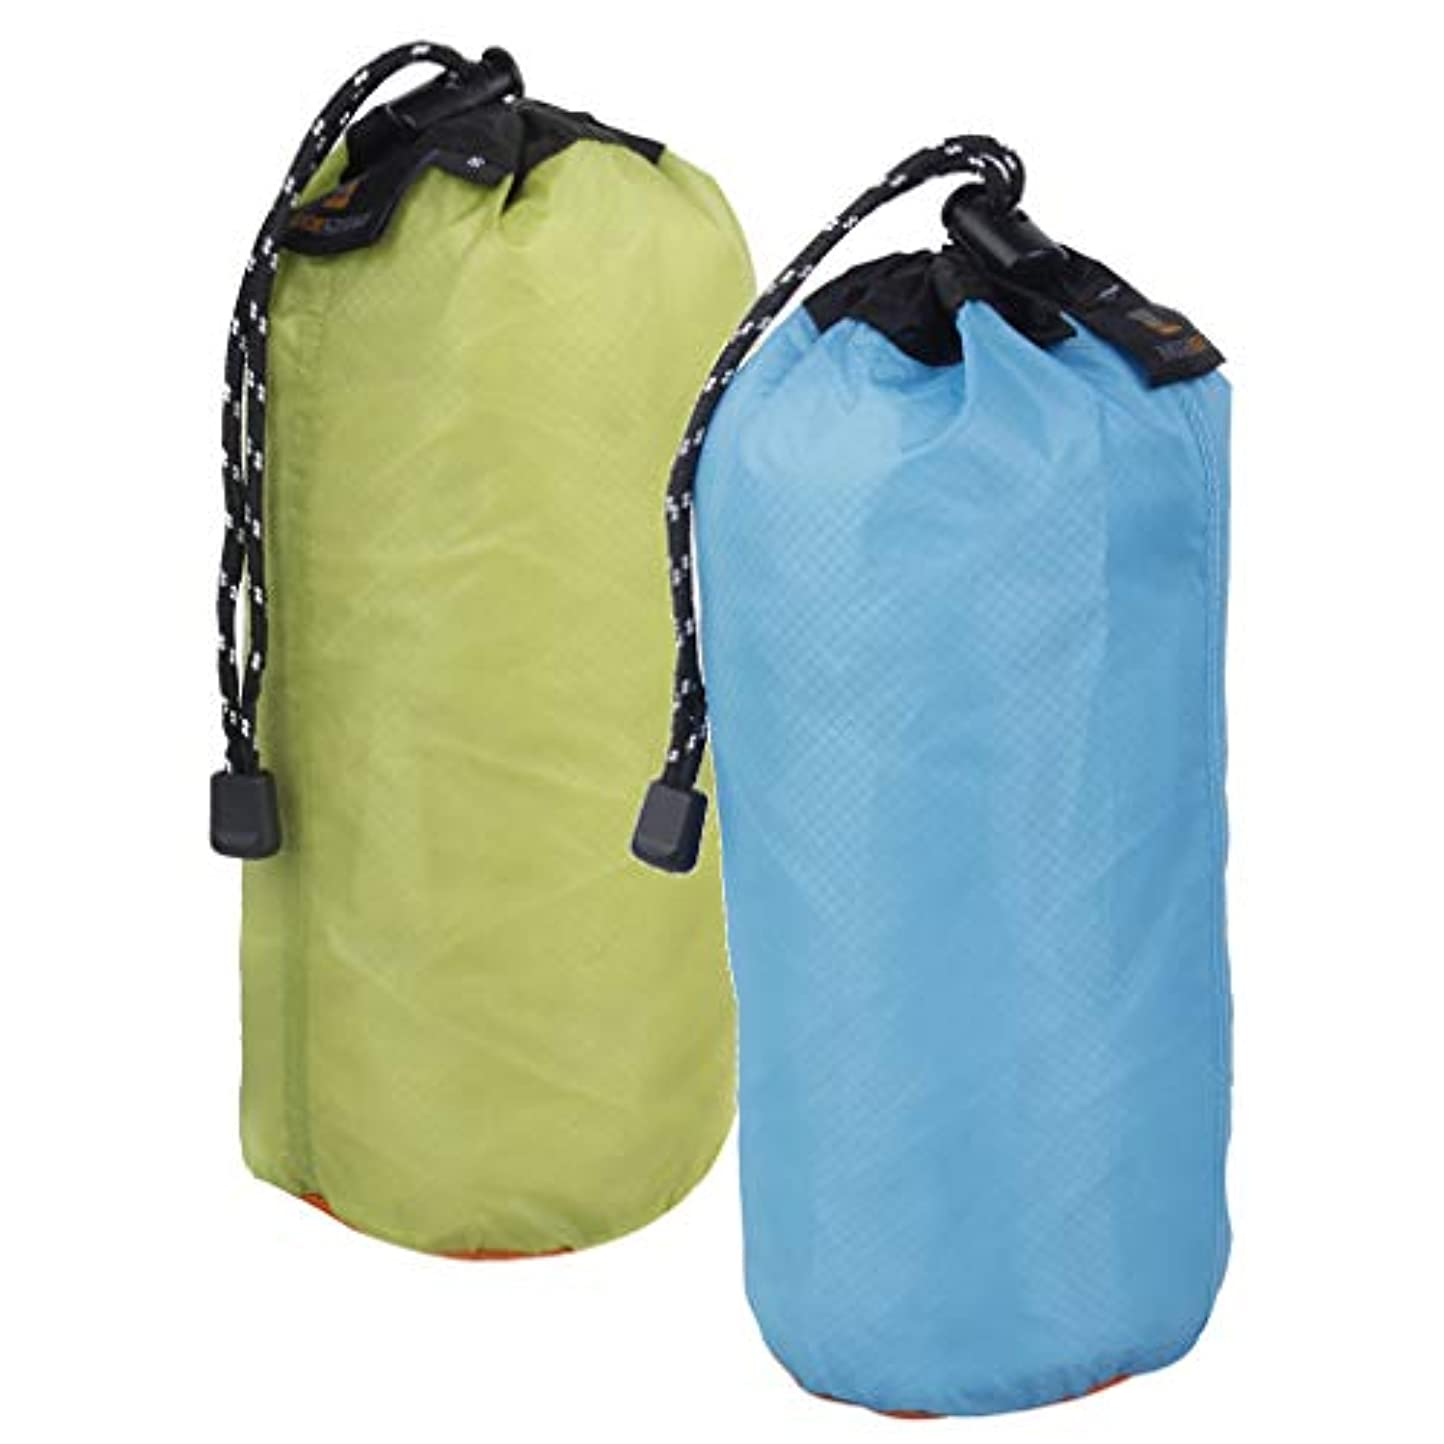 perfk ナイロン アクセサリー 2本 超軽量 巾着収 納袋ポーチ ビーチ 泳ぎキャンプ 旅行 XXLサイズ